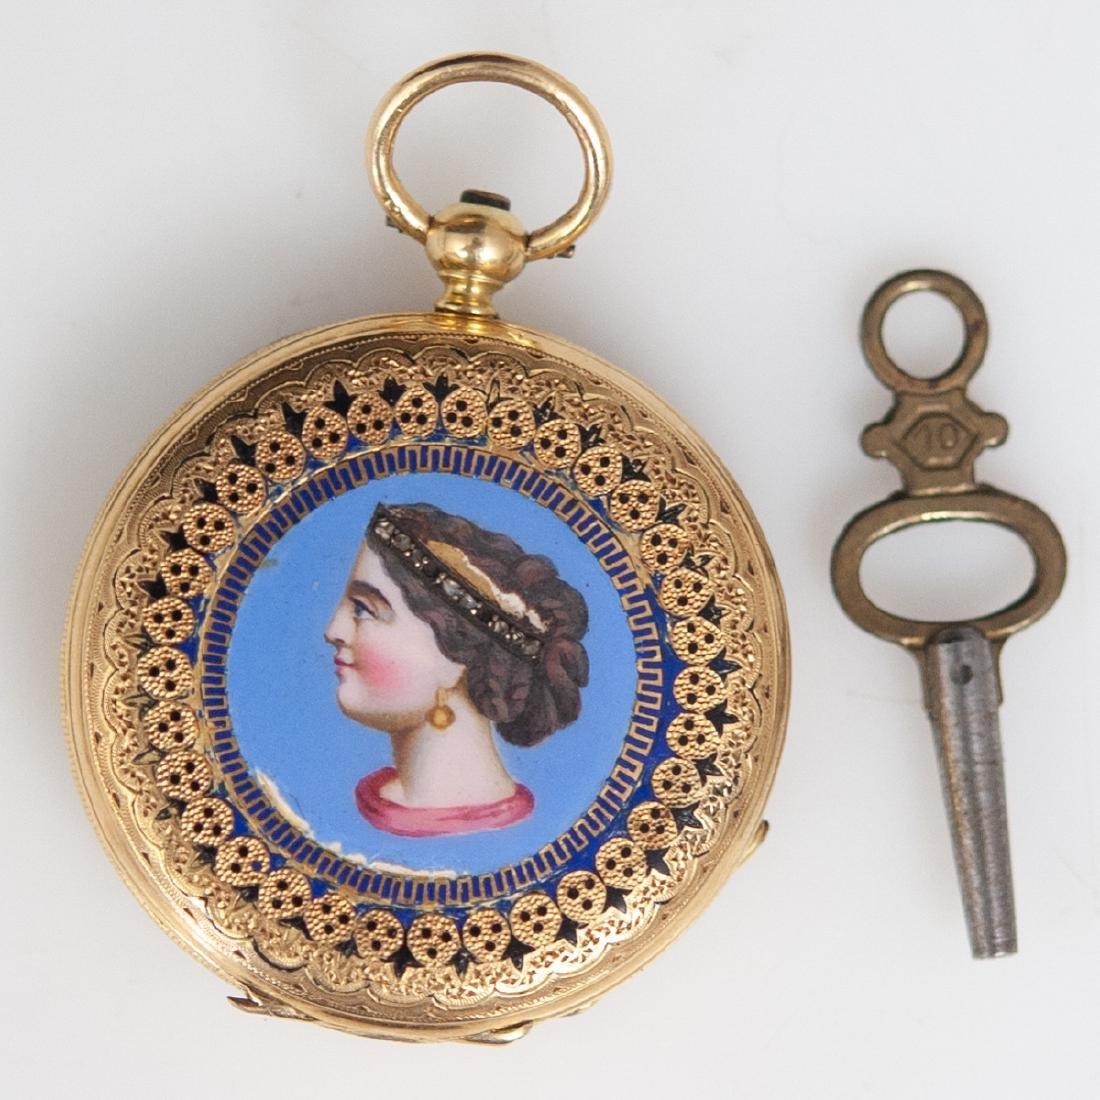 Vacheron 18kt Gold Enameled Pocket Watch